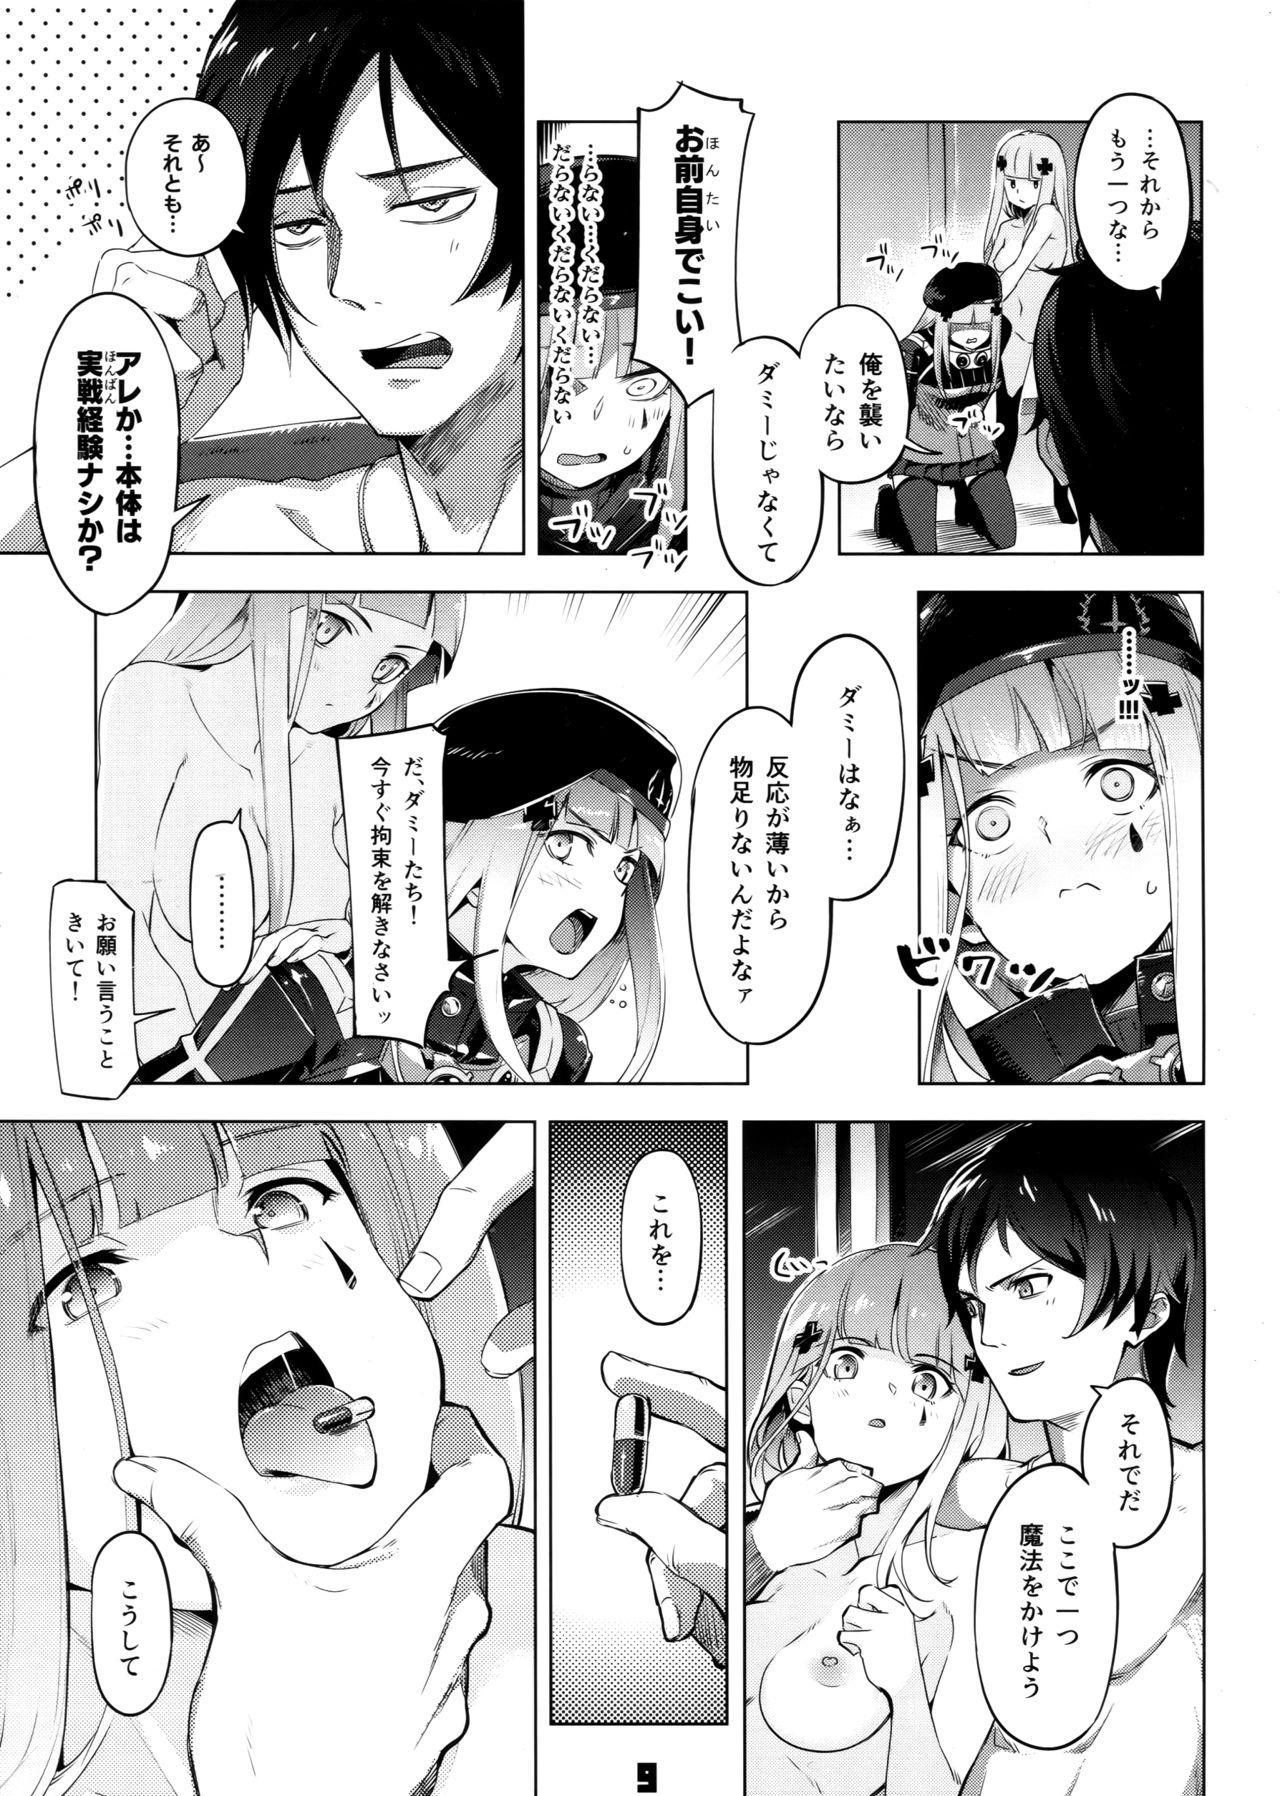 (C95) [Zombie to Yukaina Nakamatachi (Super Zombie)] Hensei Kakudai - 5-nin de Kakareba Kowakunai! (Girls' Frontline) 7